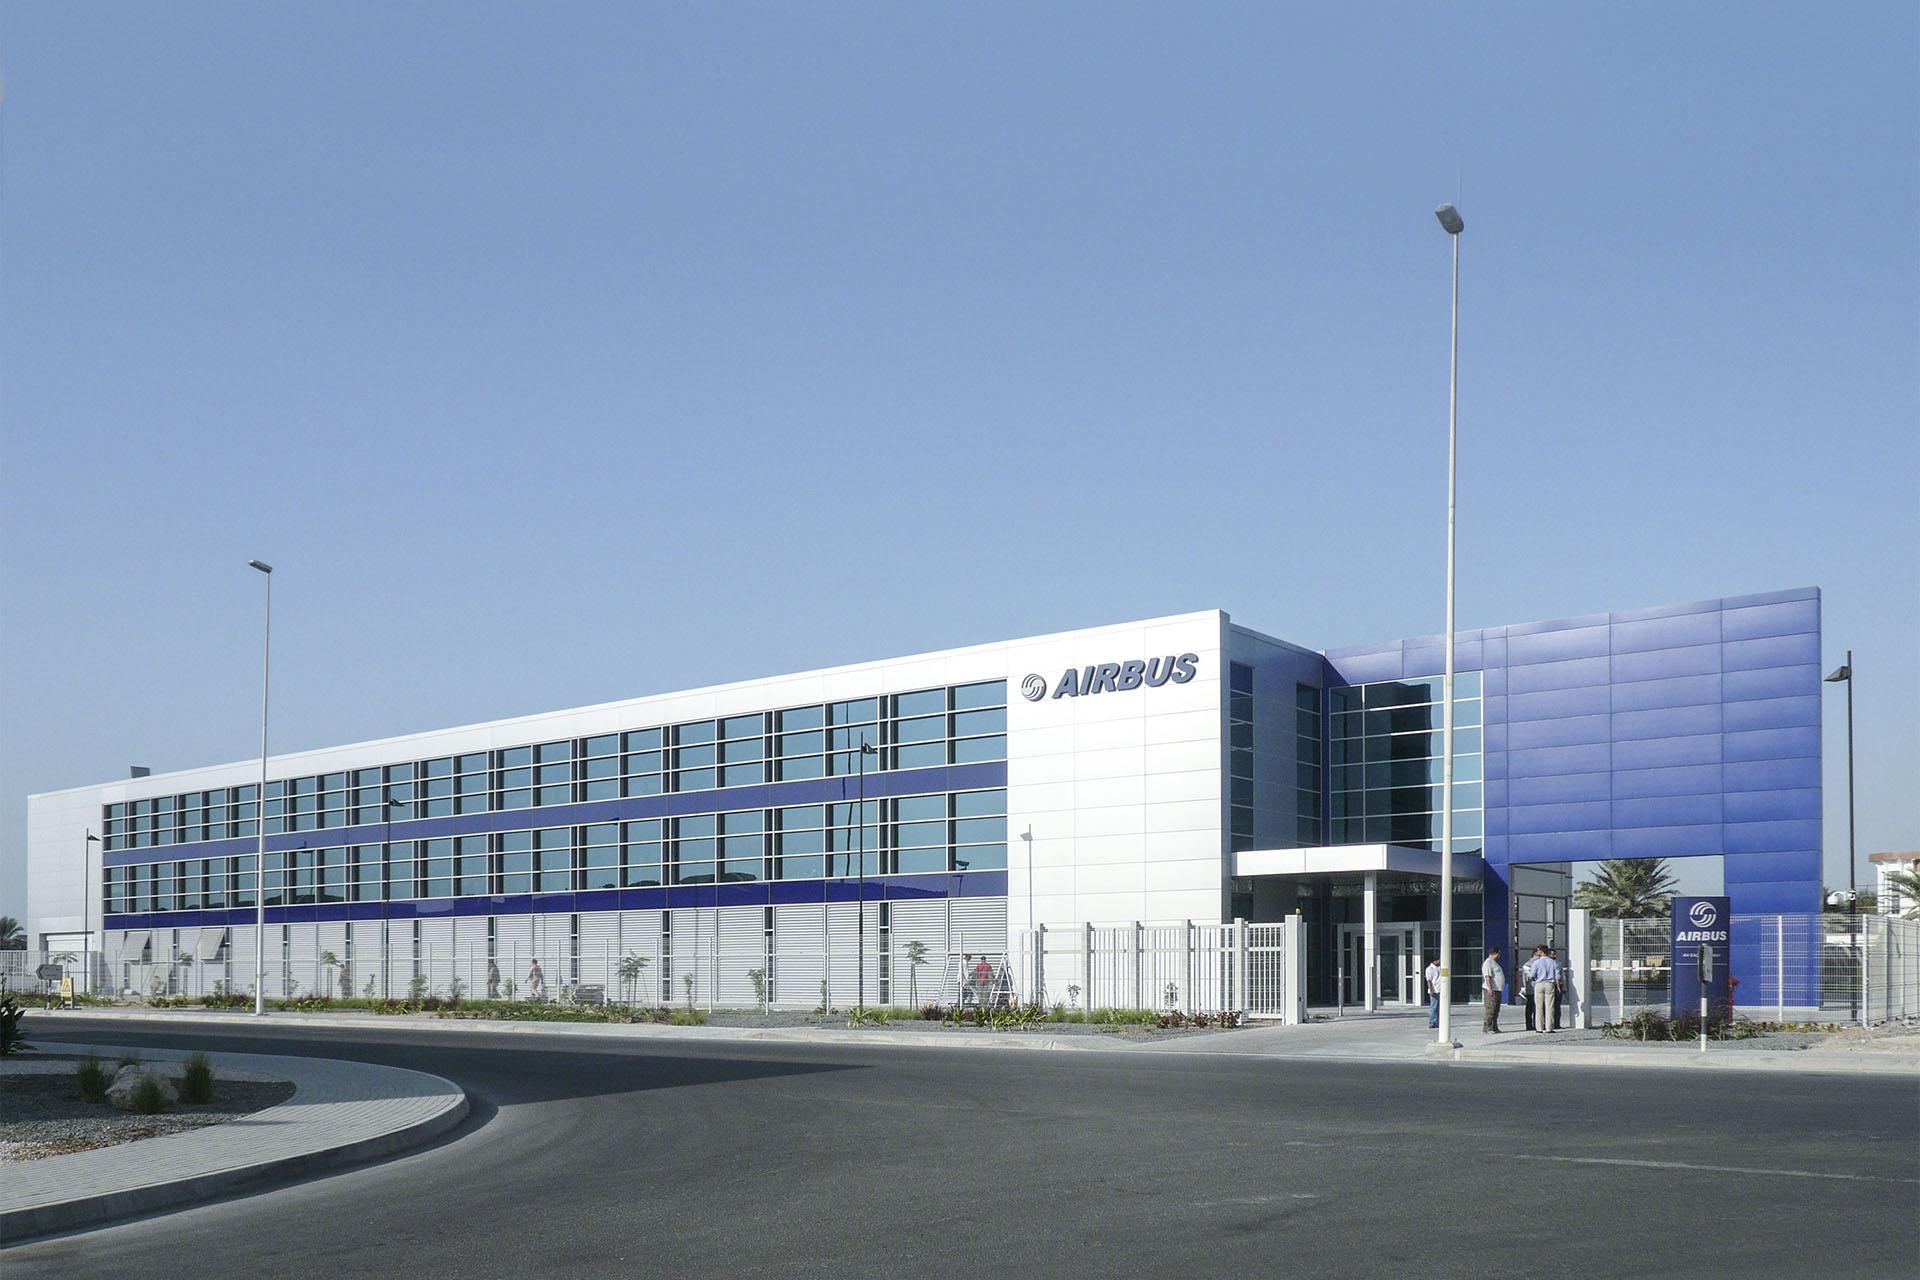 Airbus A380 Spares Centre